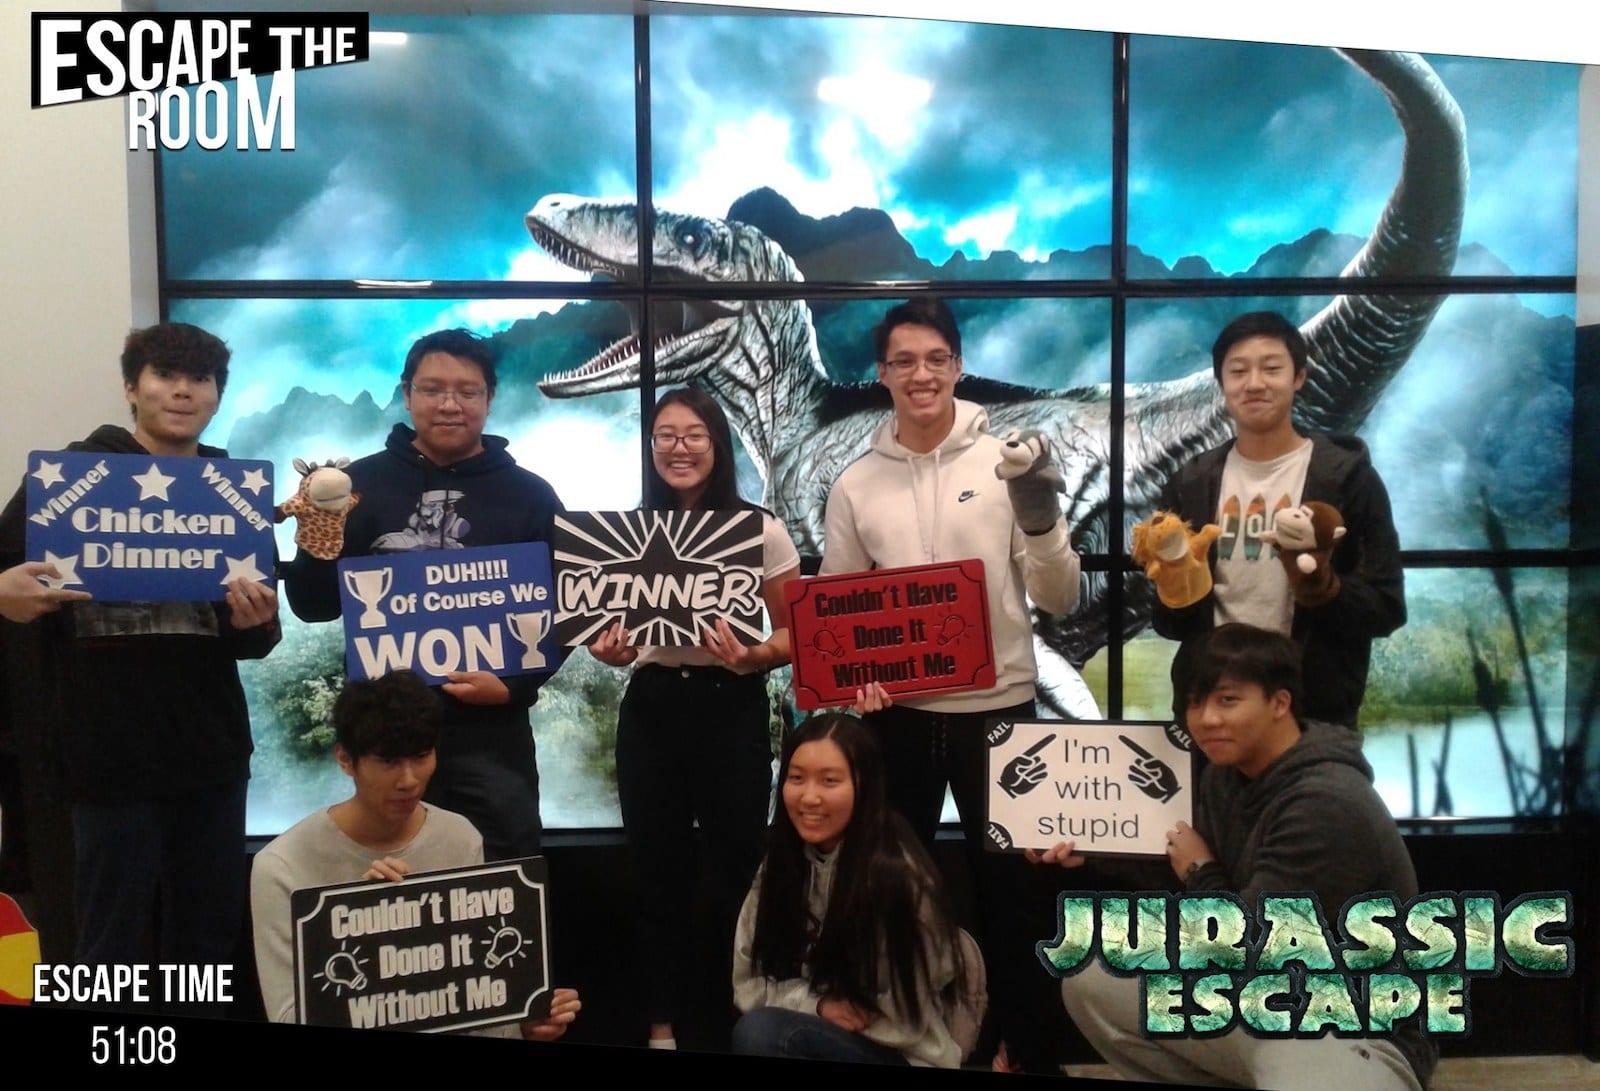 Escape the Room Denver in Littleton, CO